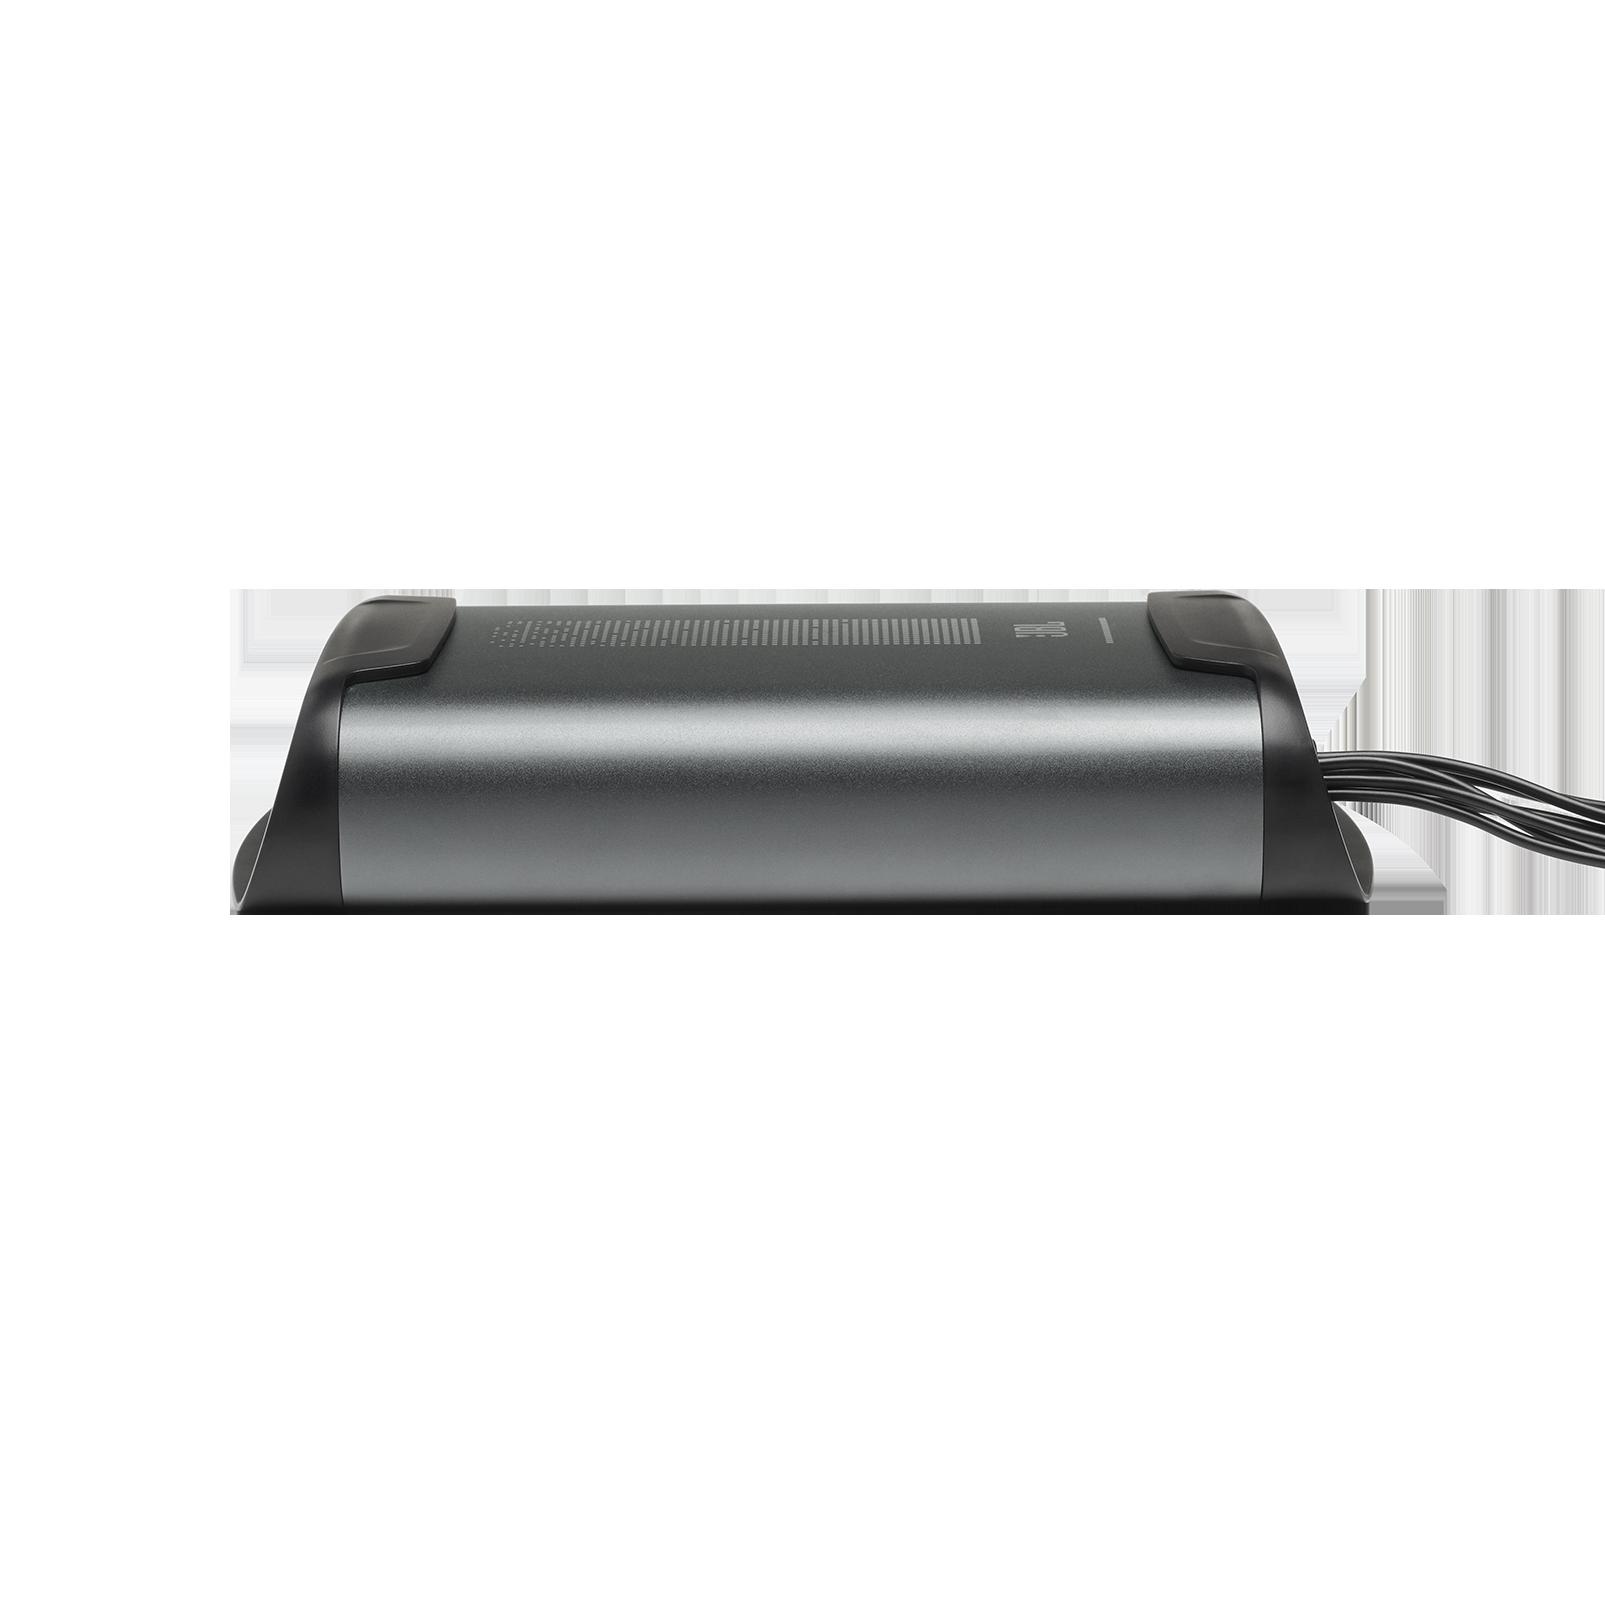 JBL DSP Amplifier DSP4086 - Black - Left